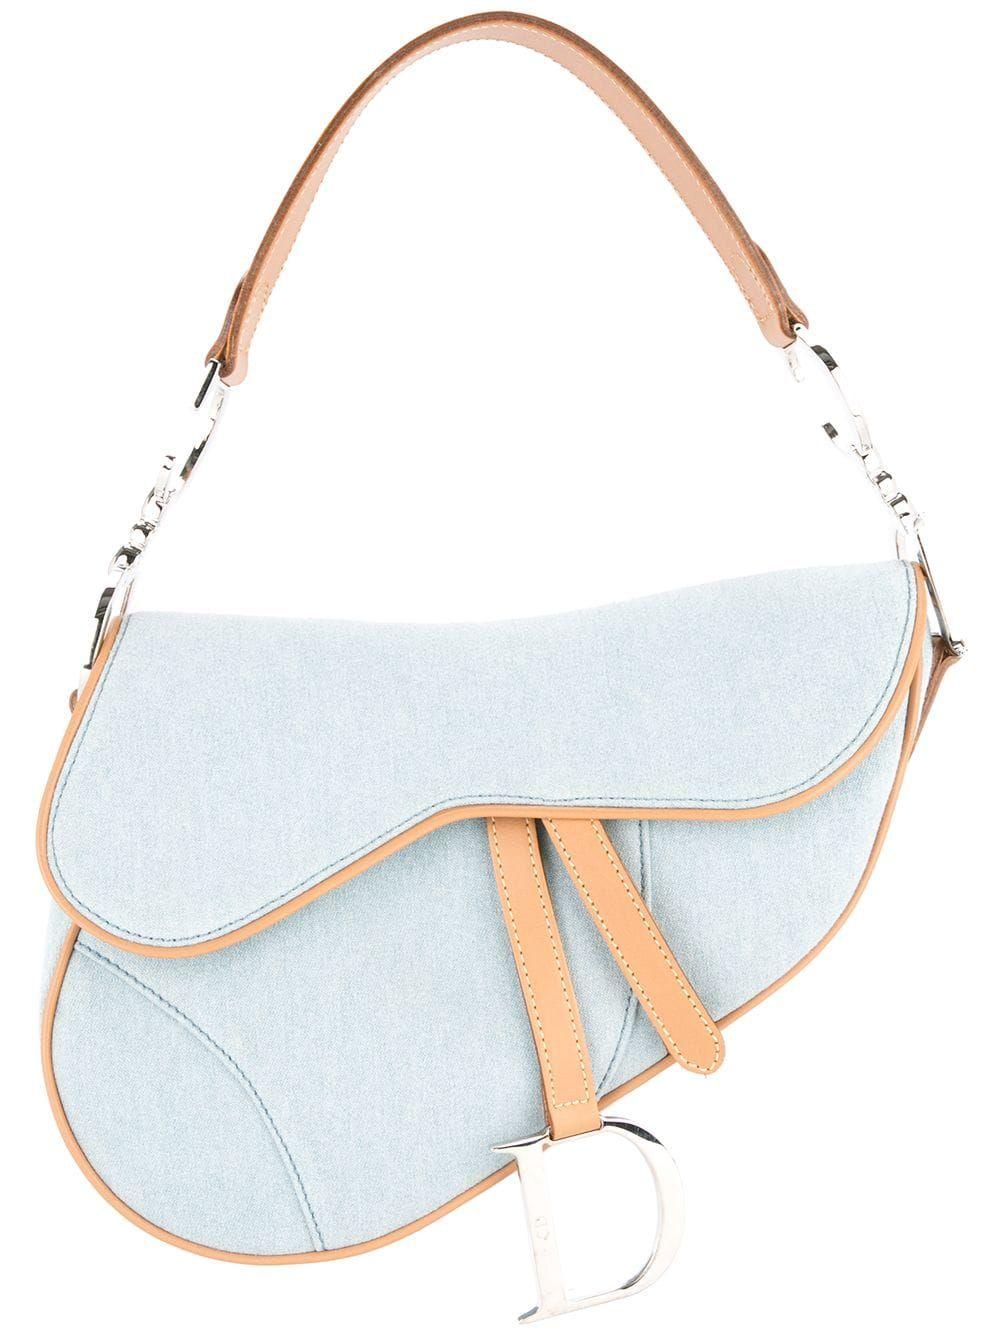 Christian Dior Pre Owned Denim Saddle Bag Farfetch Dior Saddle Bag Bags Dior